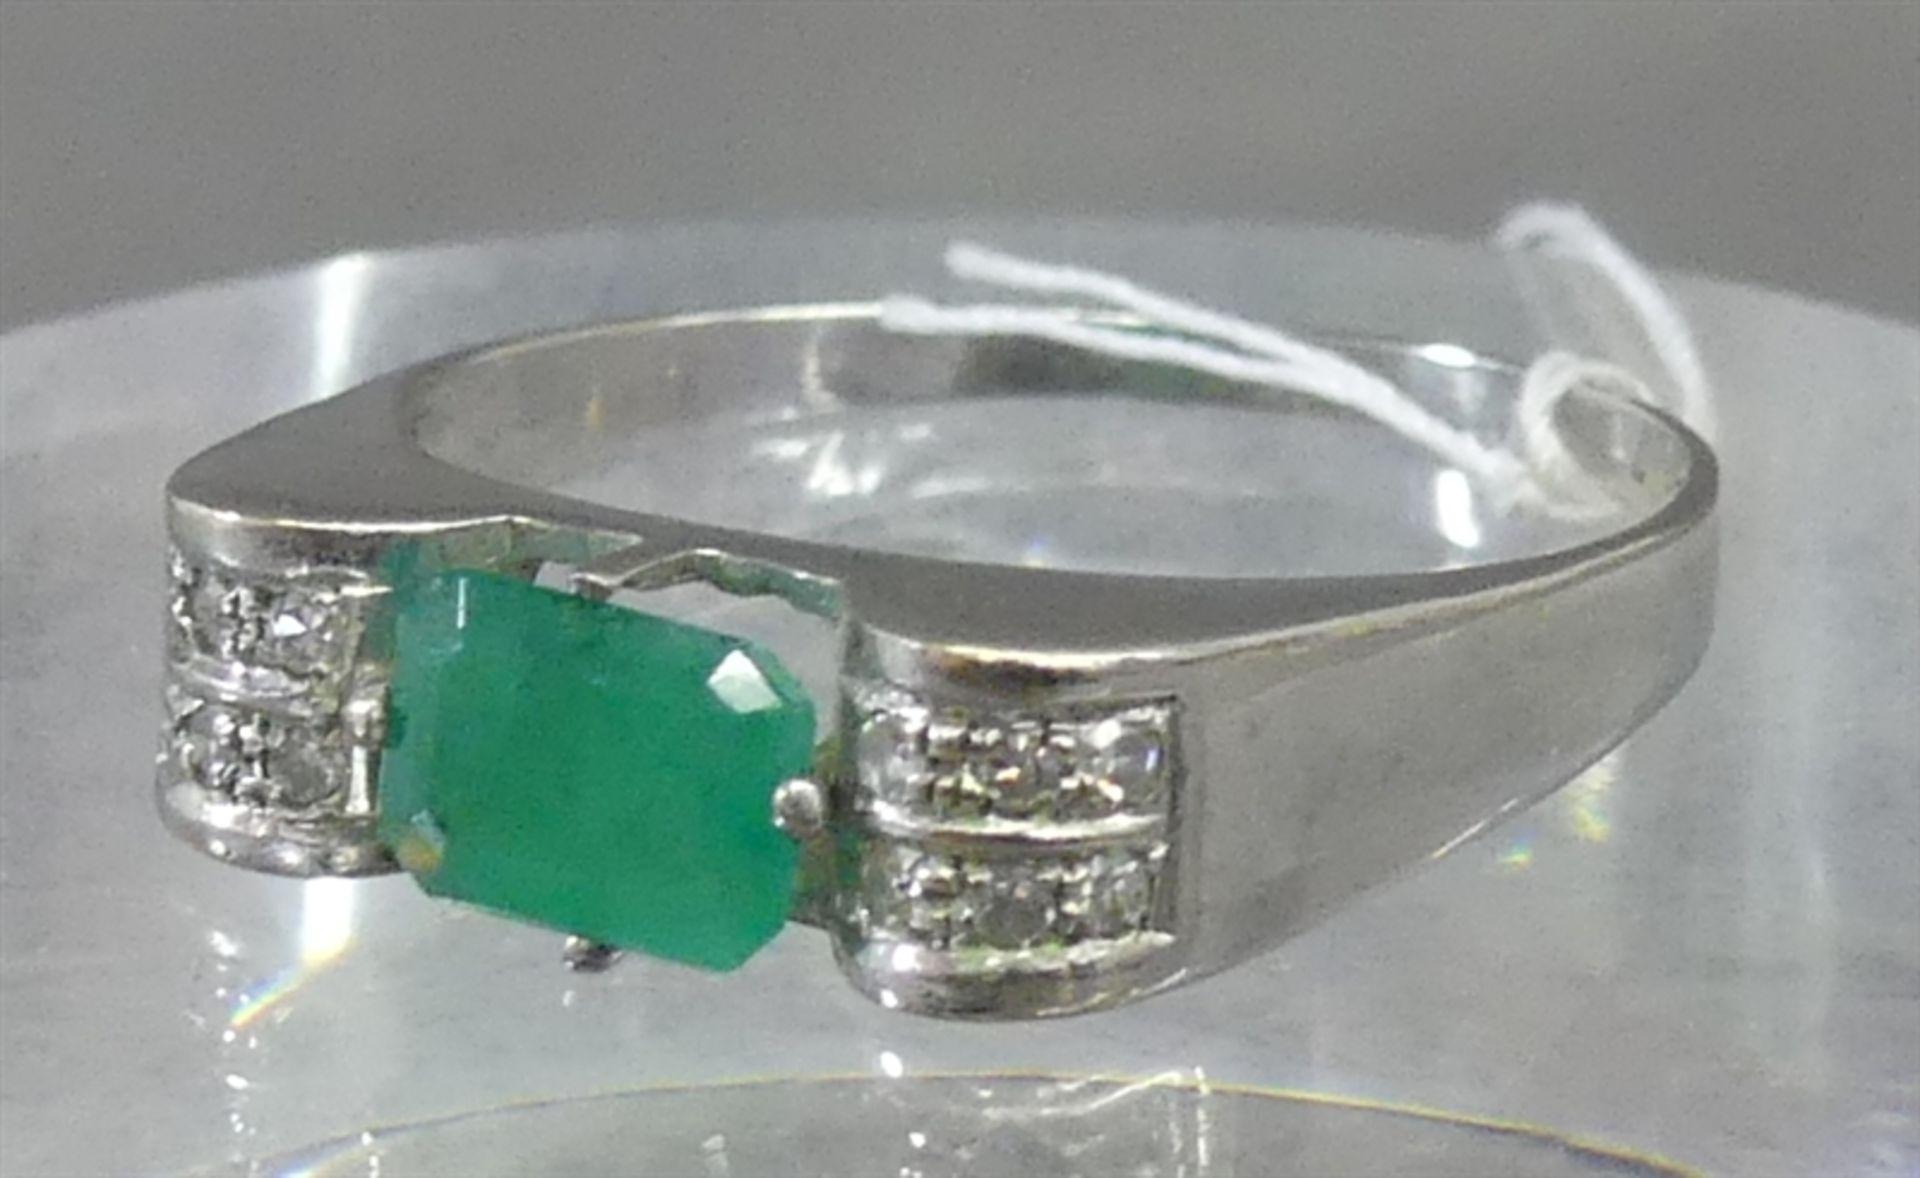 Damenring 14 kt. Weißgold, 1 Smaragd, Emeraldcut, 12 kl. Diamanten als Besatz, ca. 4 g schwer, RM